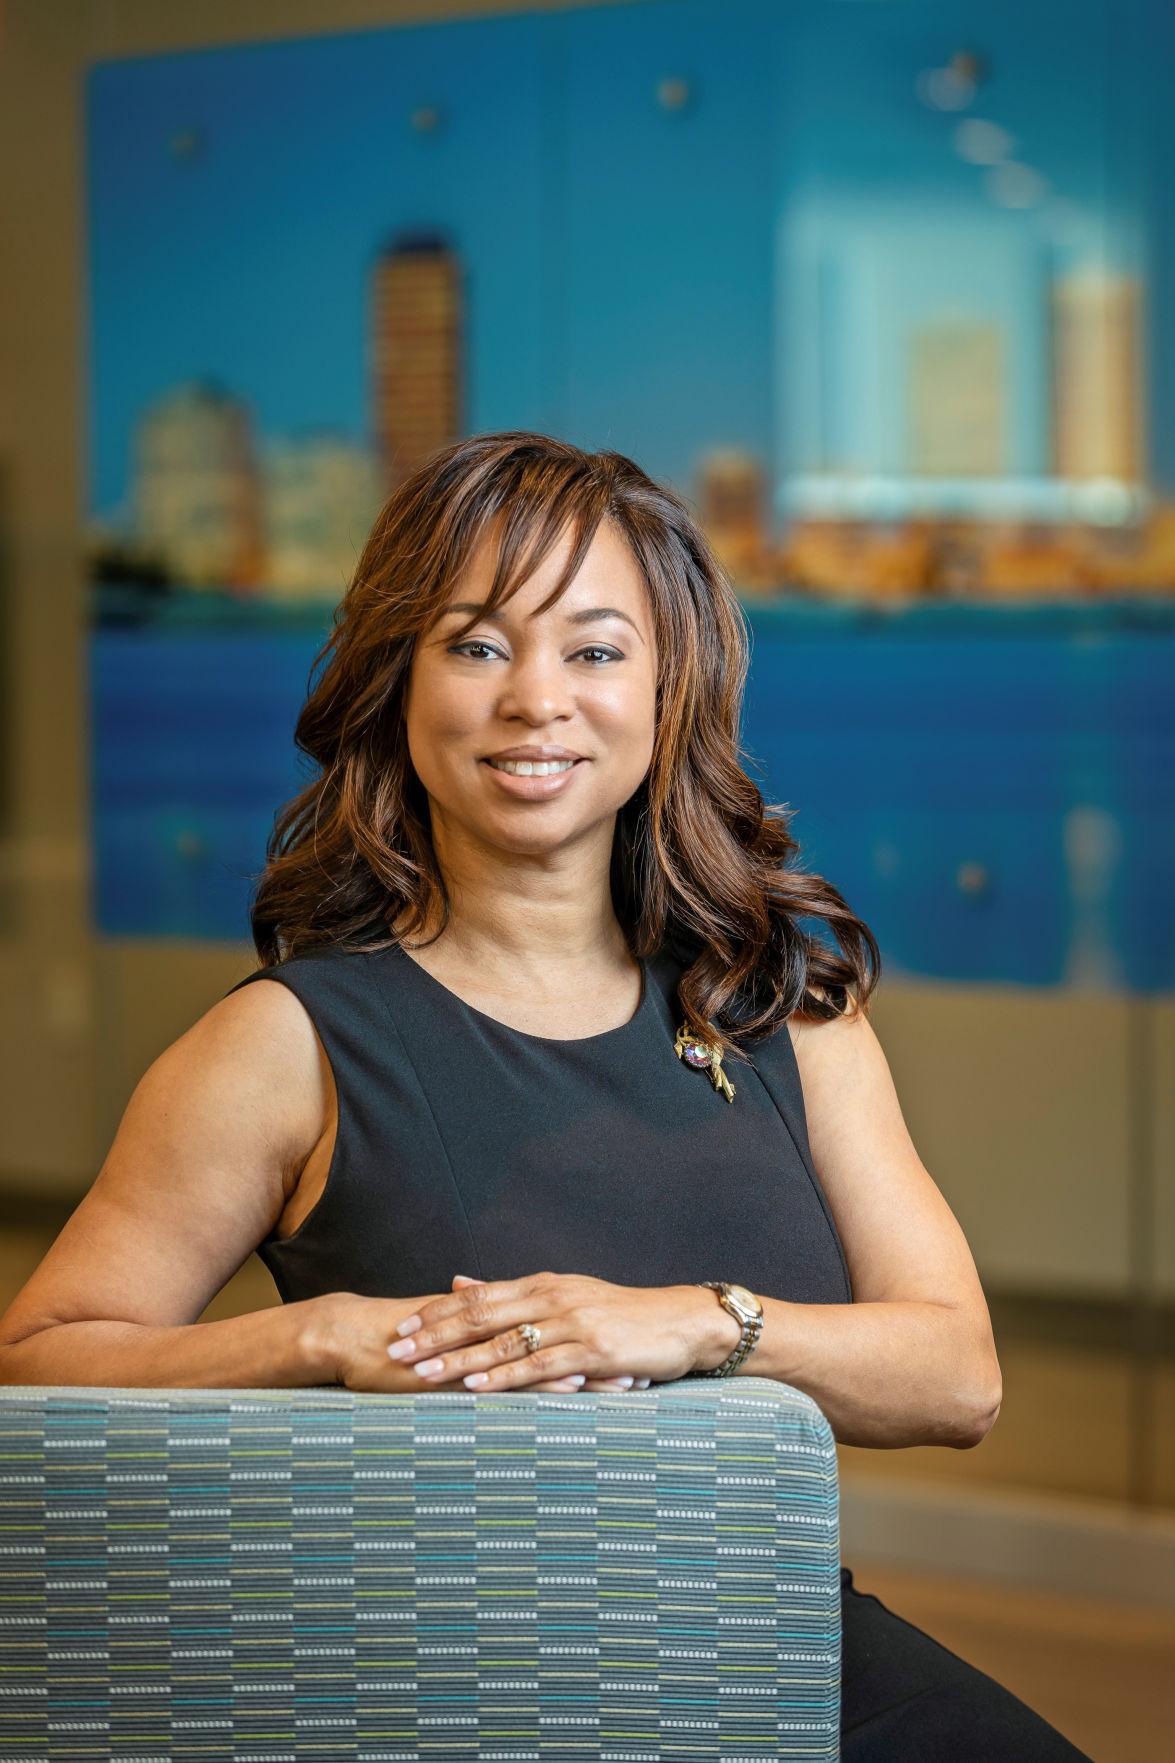 Charlotte Claiborne chosen to head Bridge Center for Hope in Baton Rouge